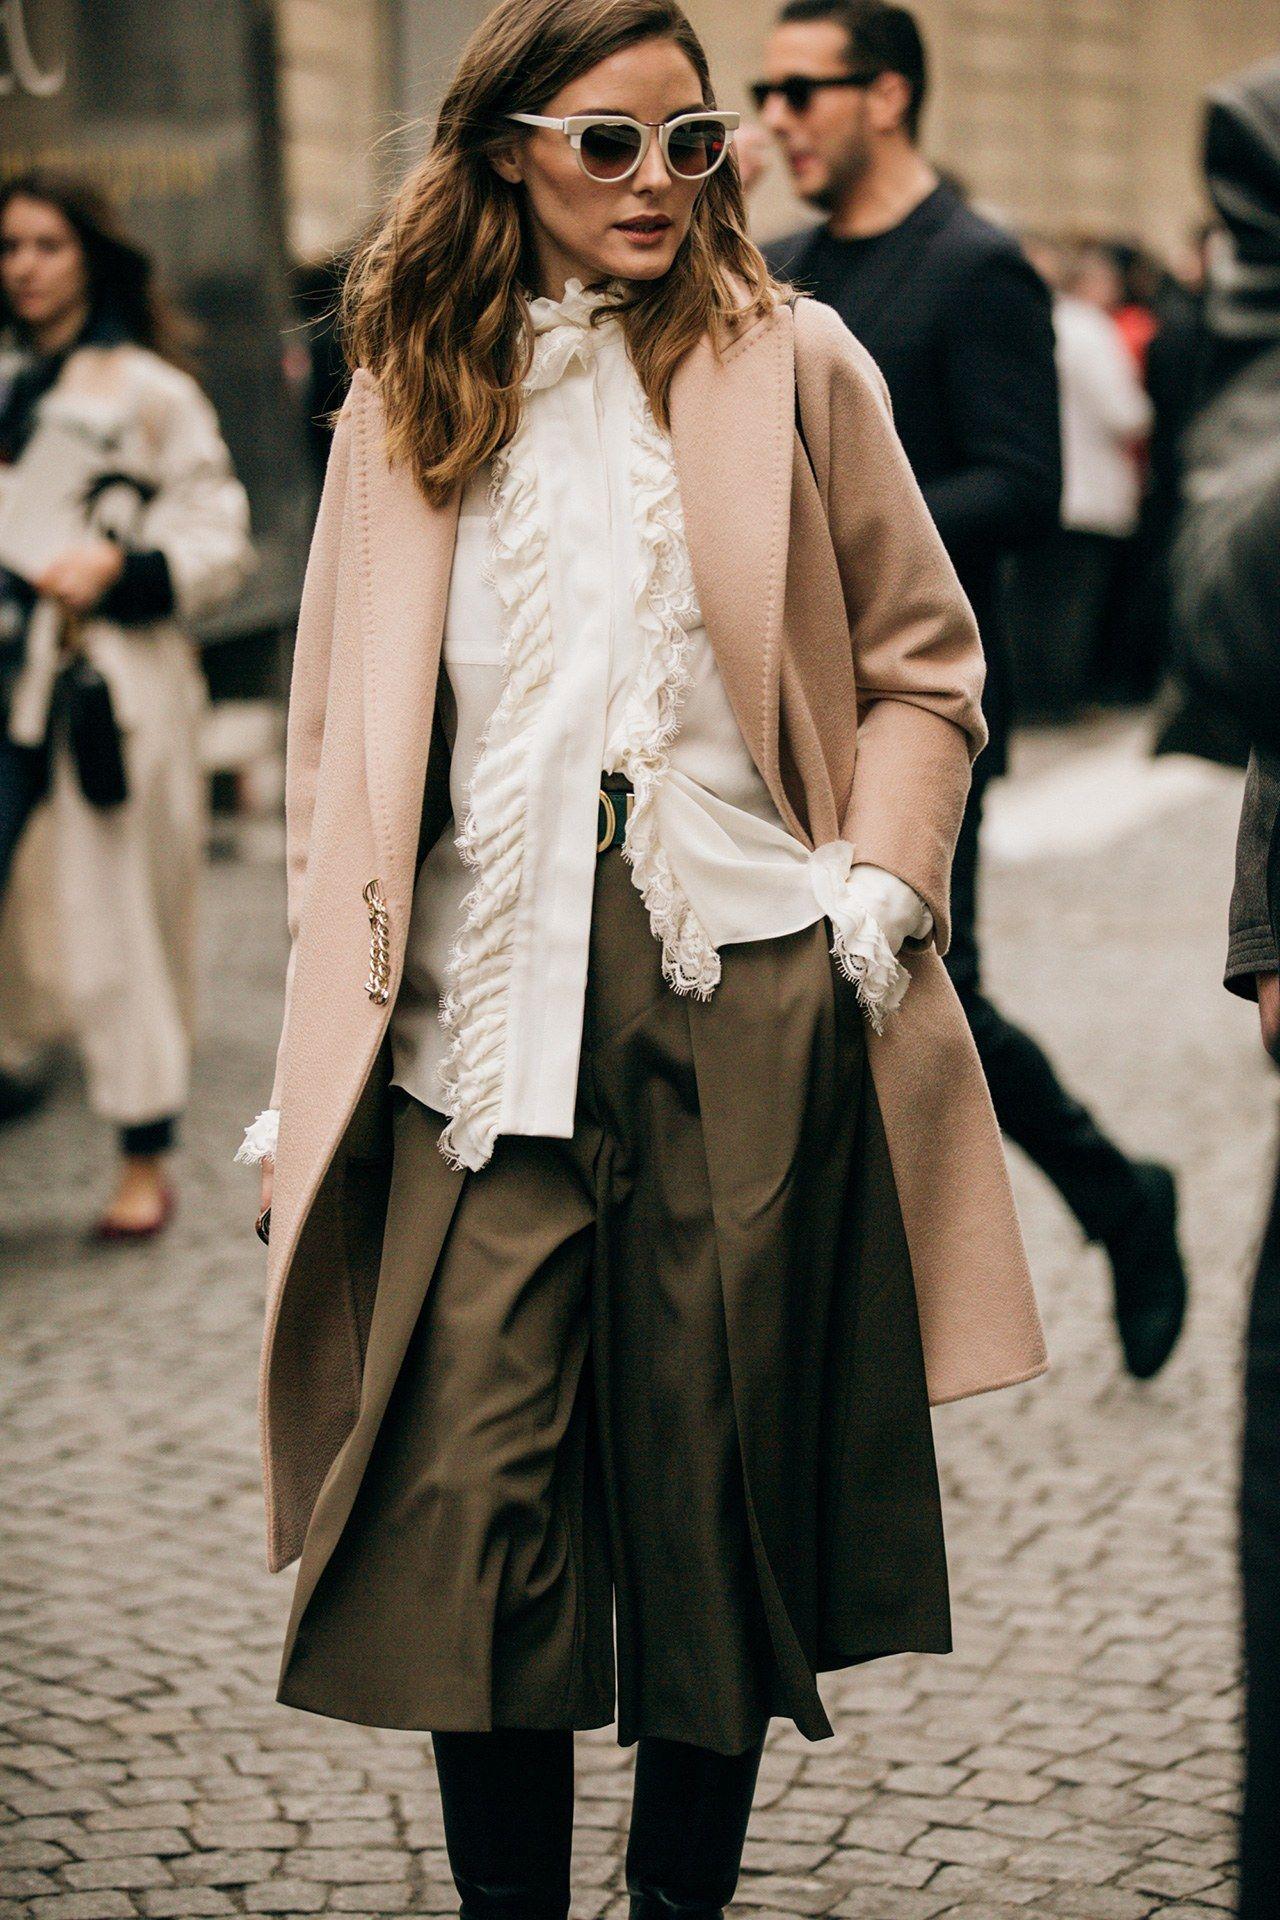 half off c4c46 1e12c Street Style: look e tendenze alla Paris Fashion Week ...